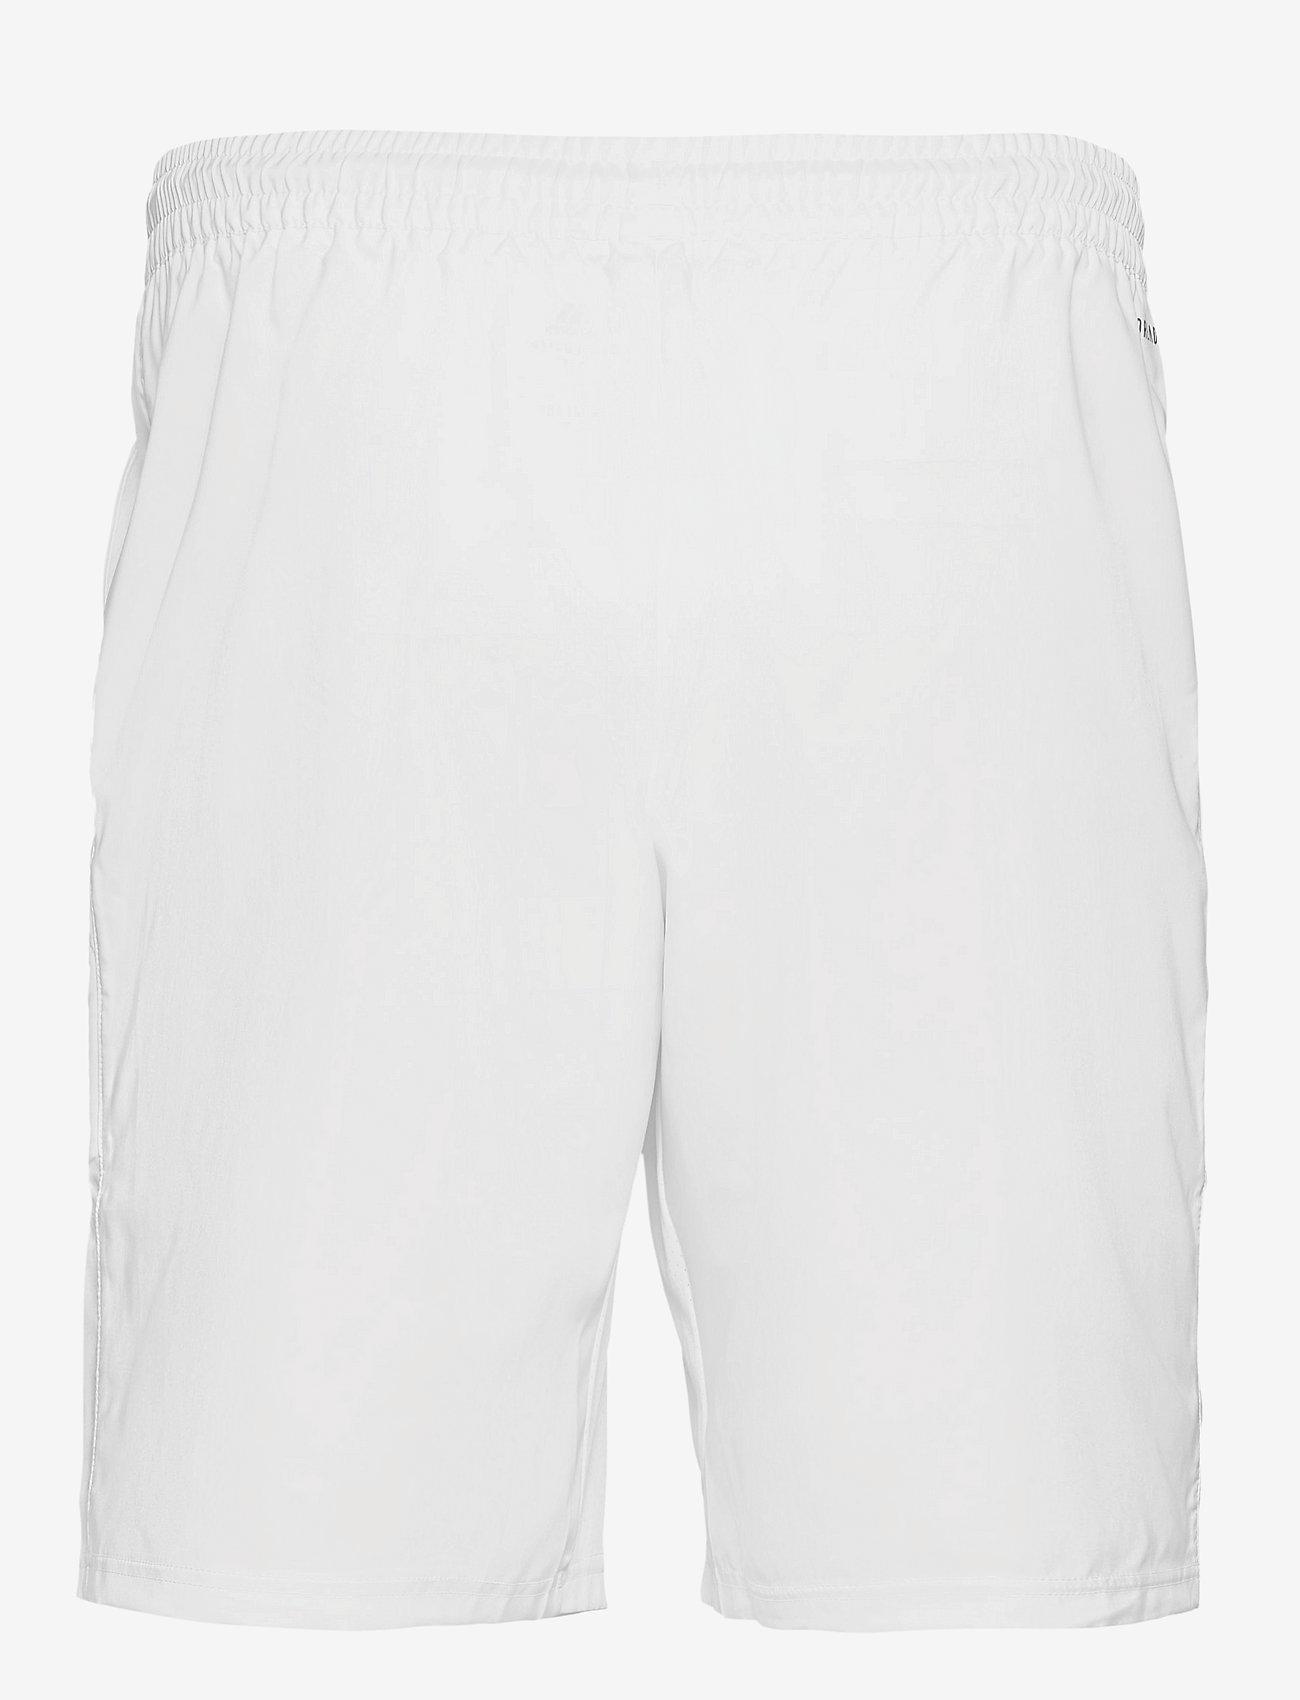 adidas Performance - CLUB 3-STRIPE SHORTS - training korte broek - 000/white - 1